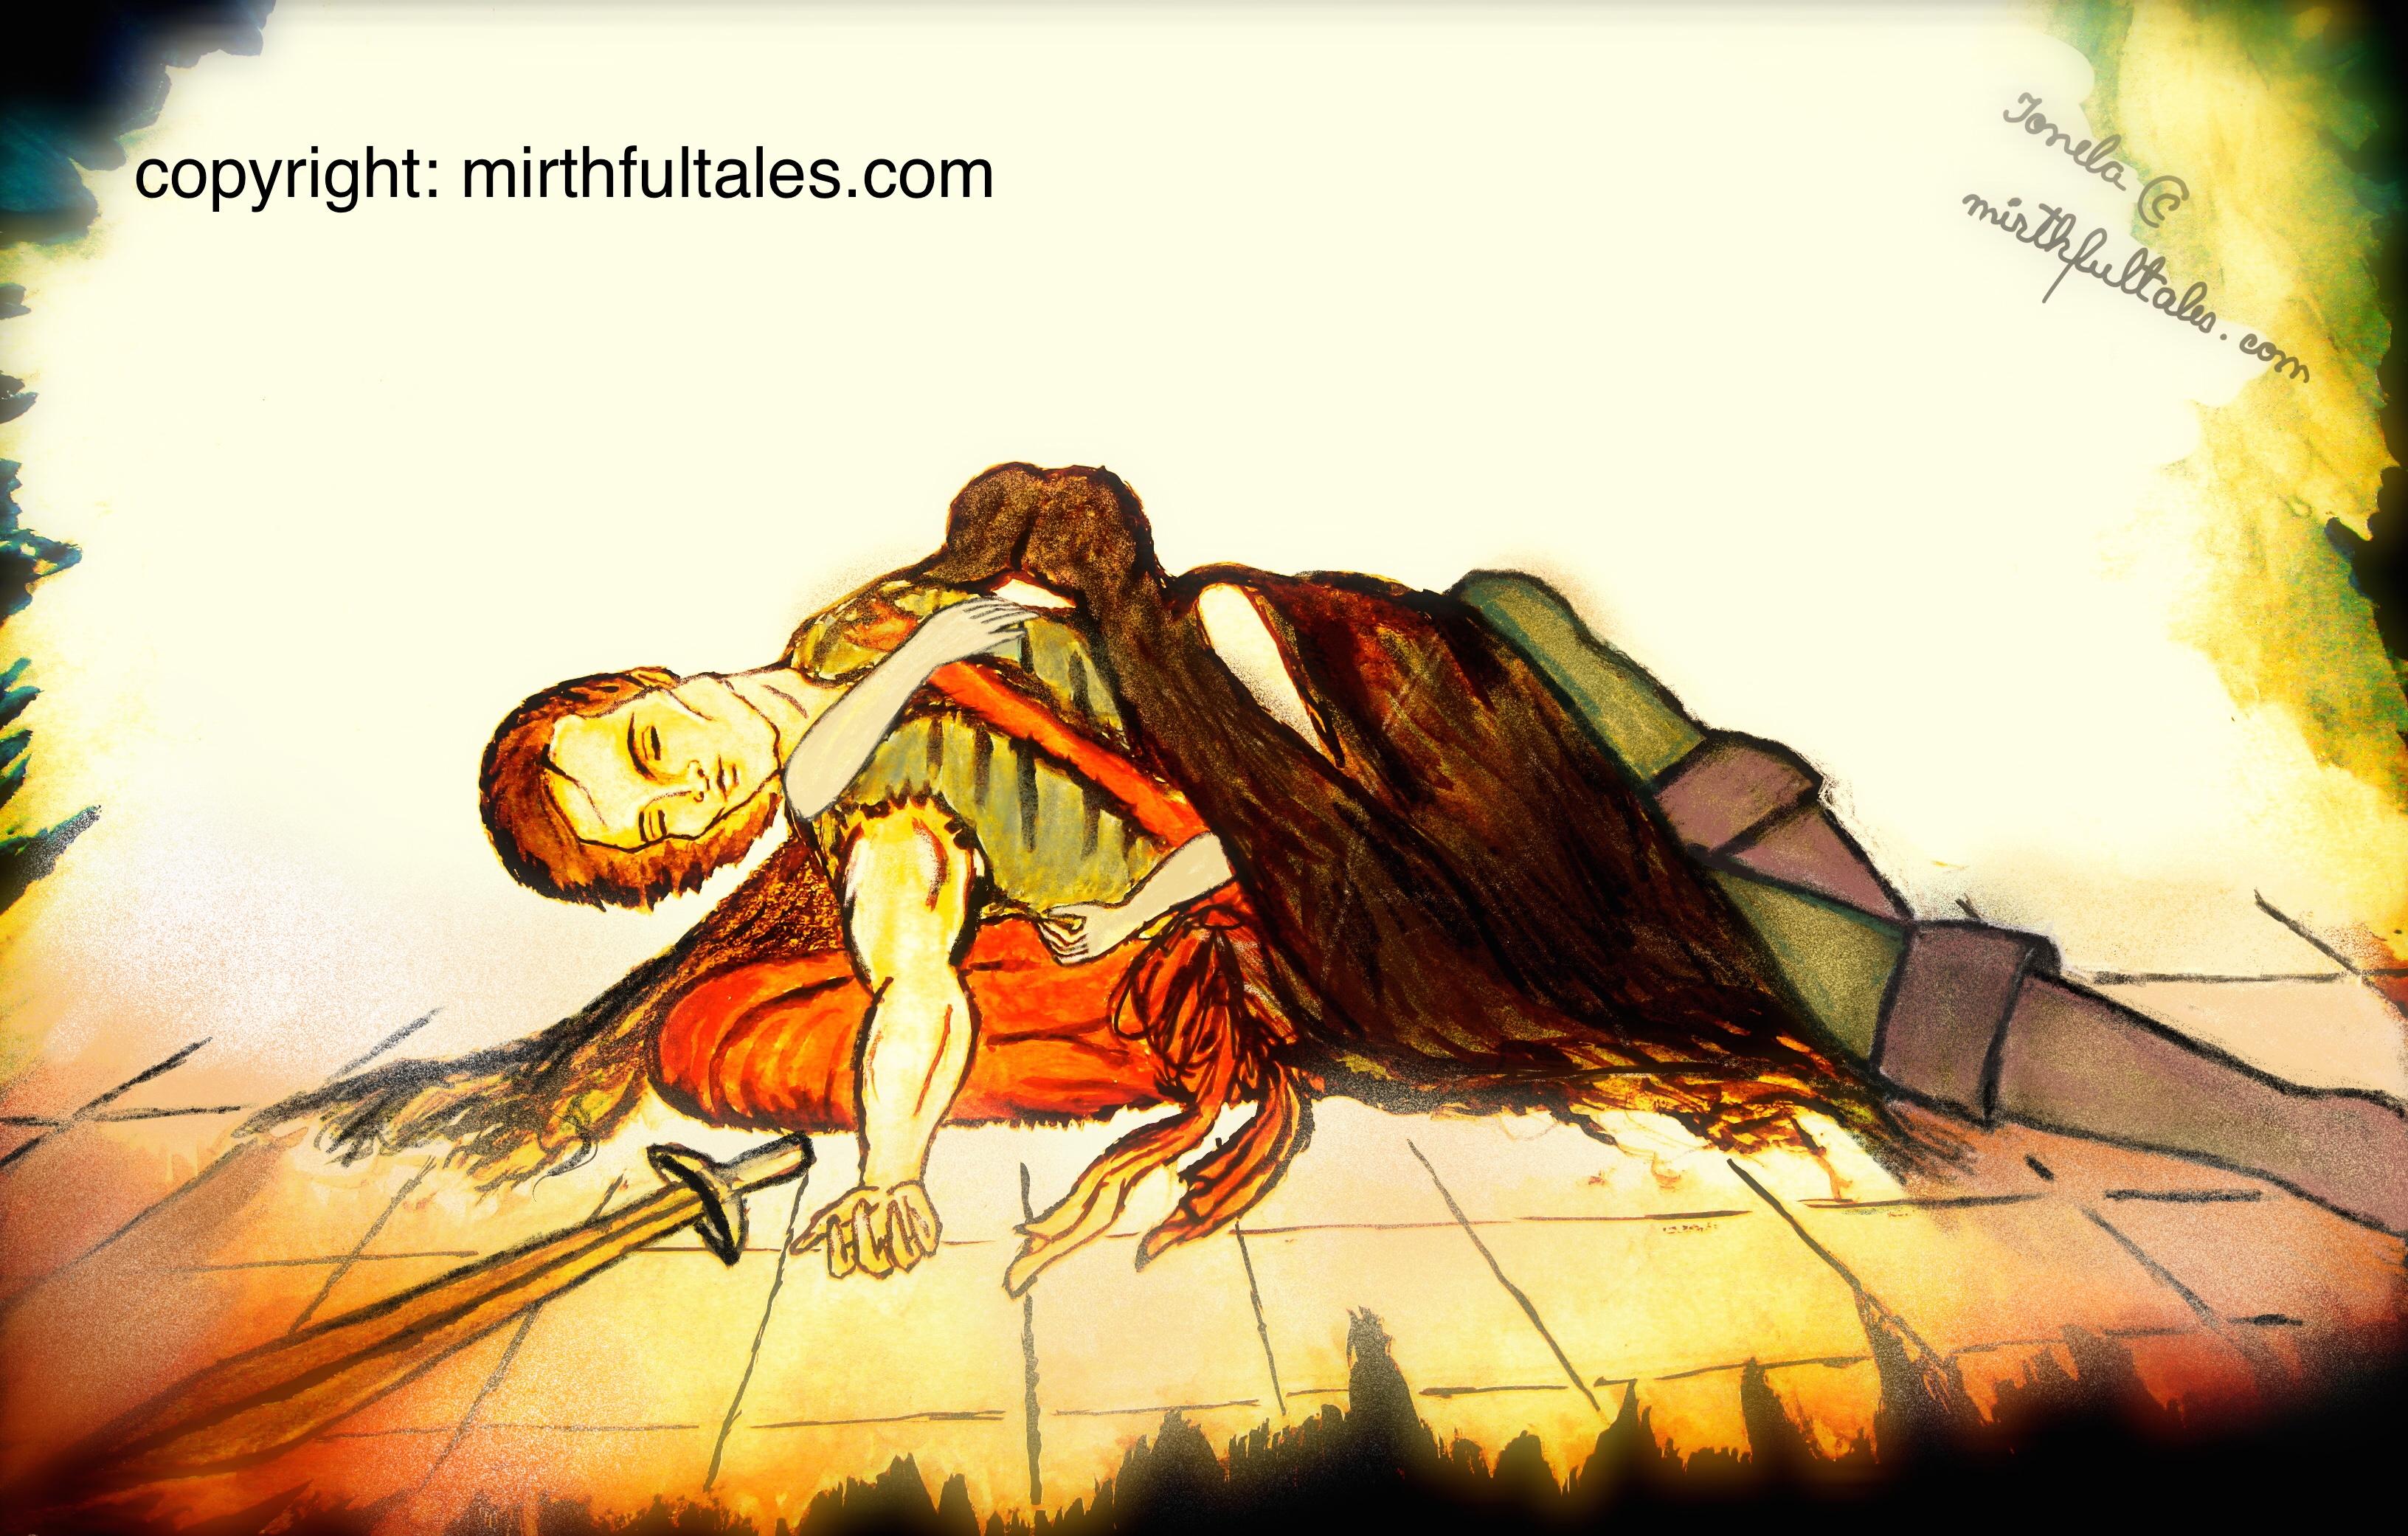 mirthfultales.com_new_fairy_tales_prince (1)